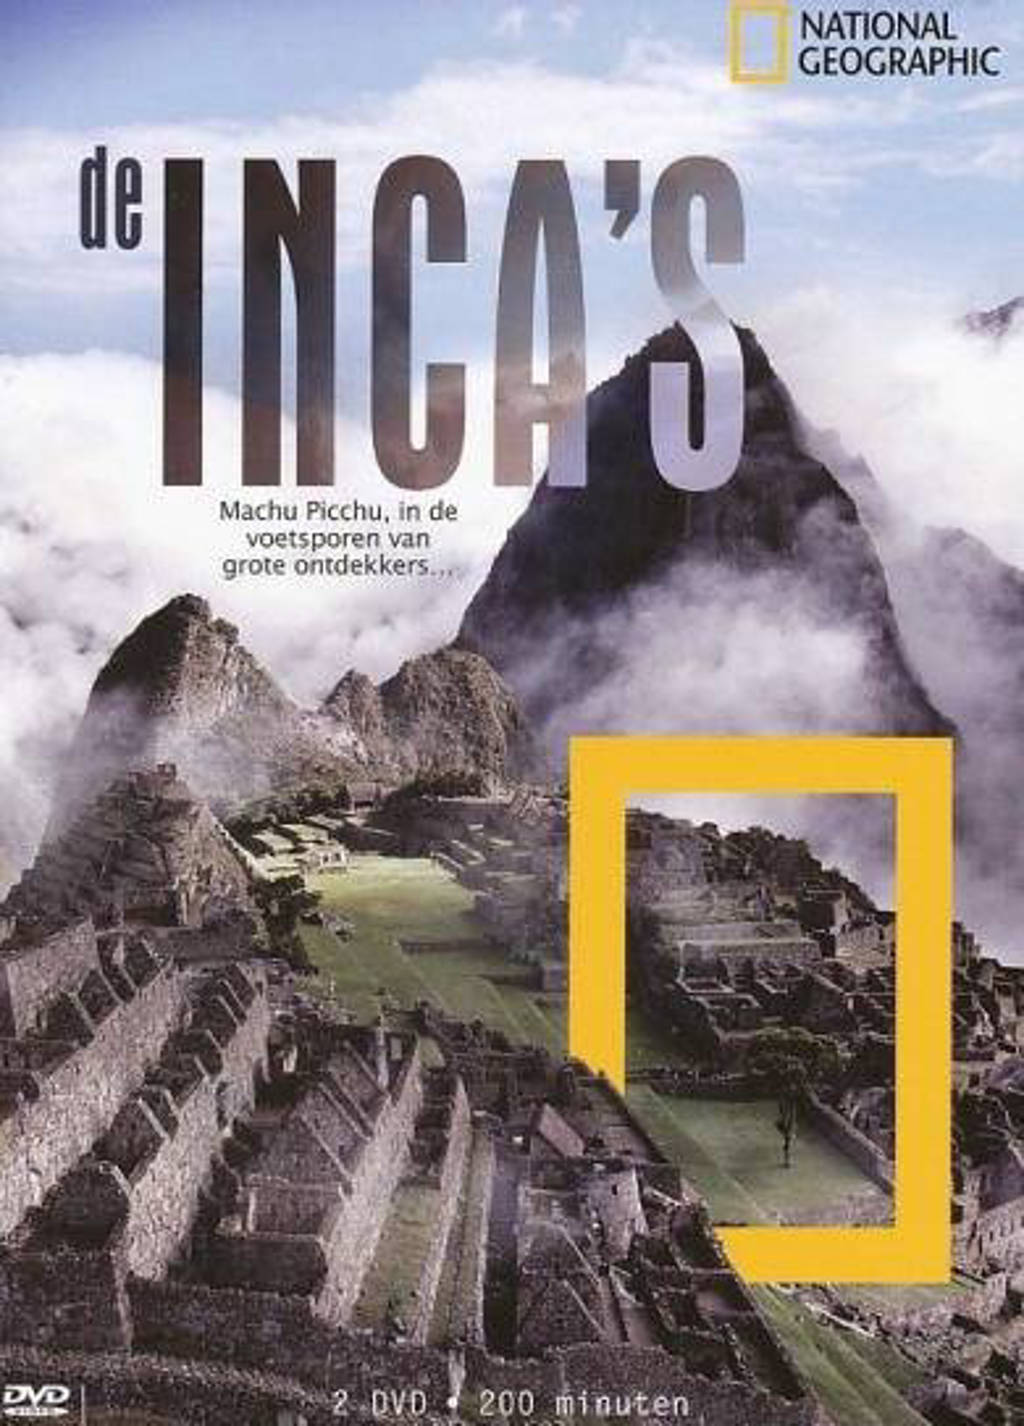 National geographic - Inca box (DVD)